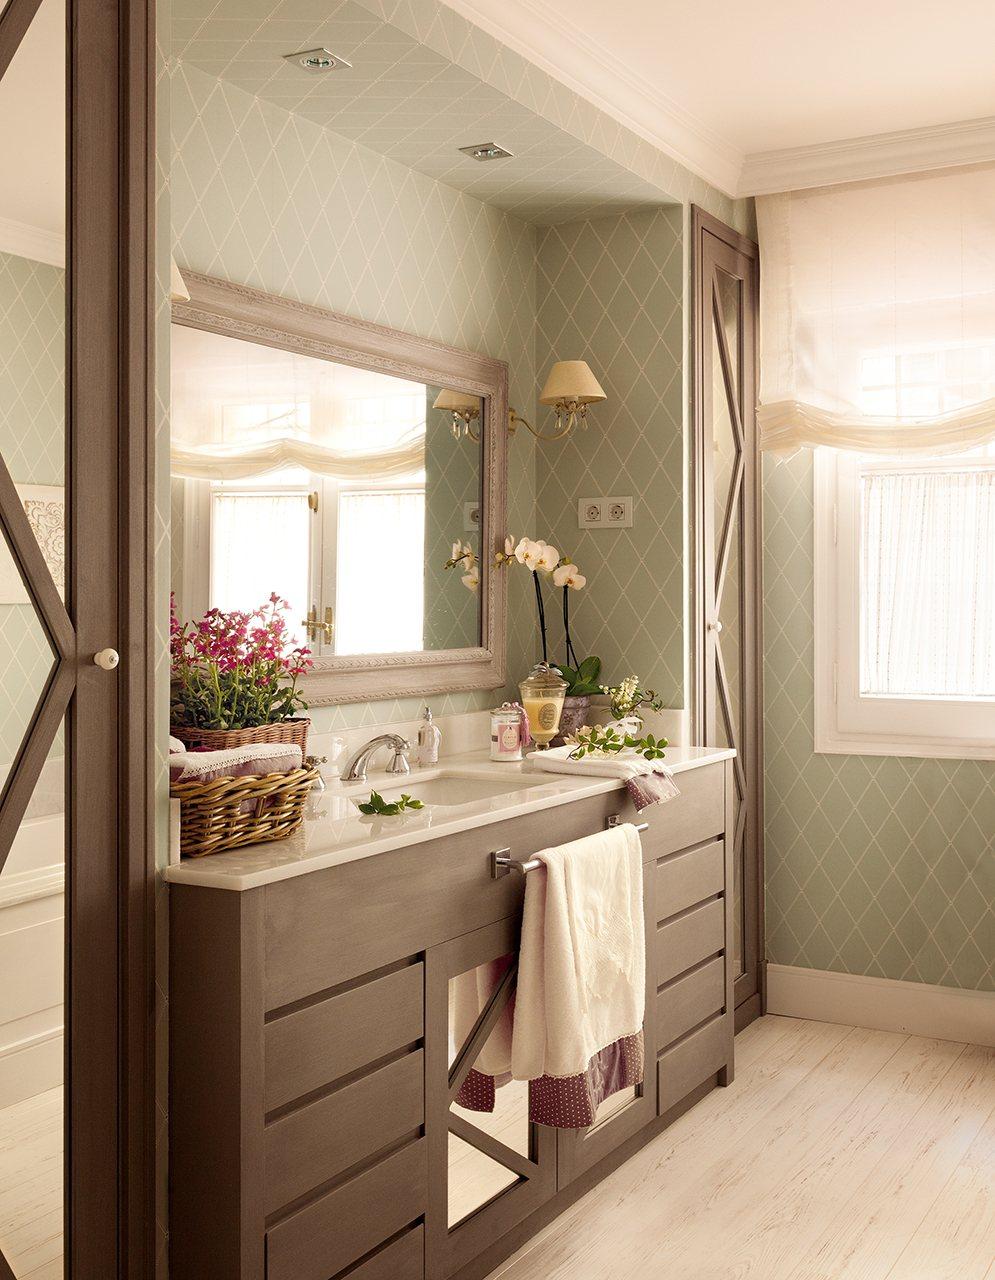 Orden perfecto un armario para cada cosa for Mueble estrecho cocina